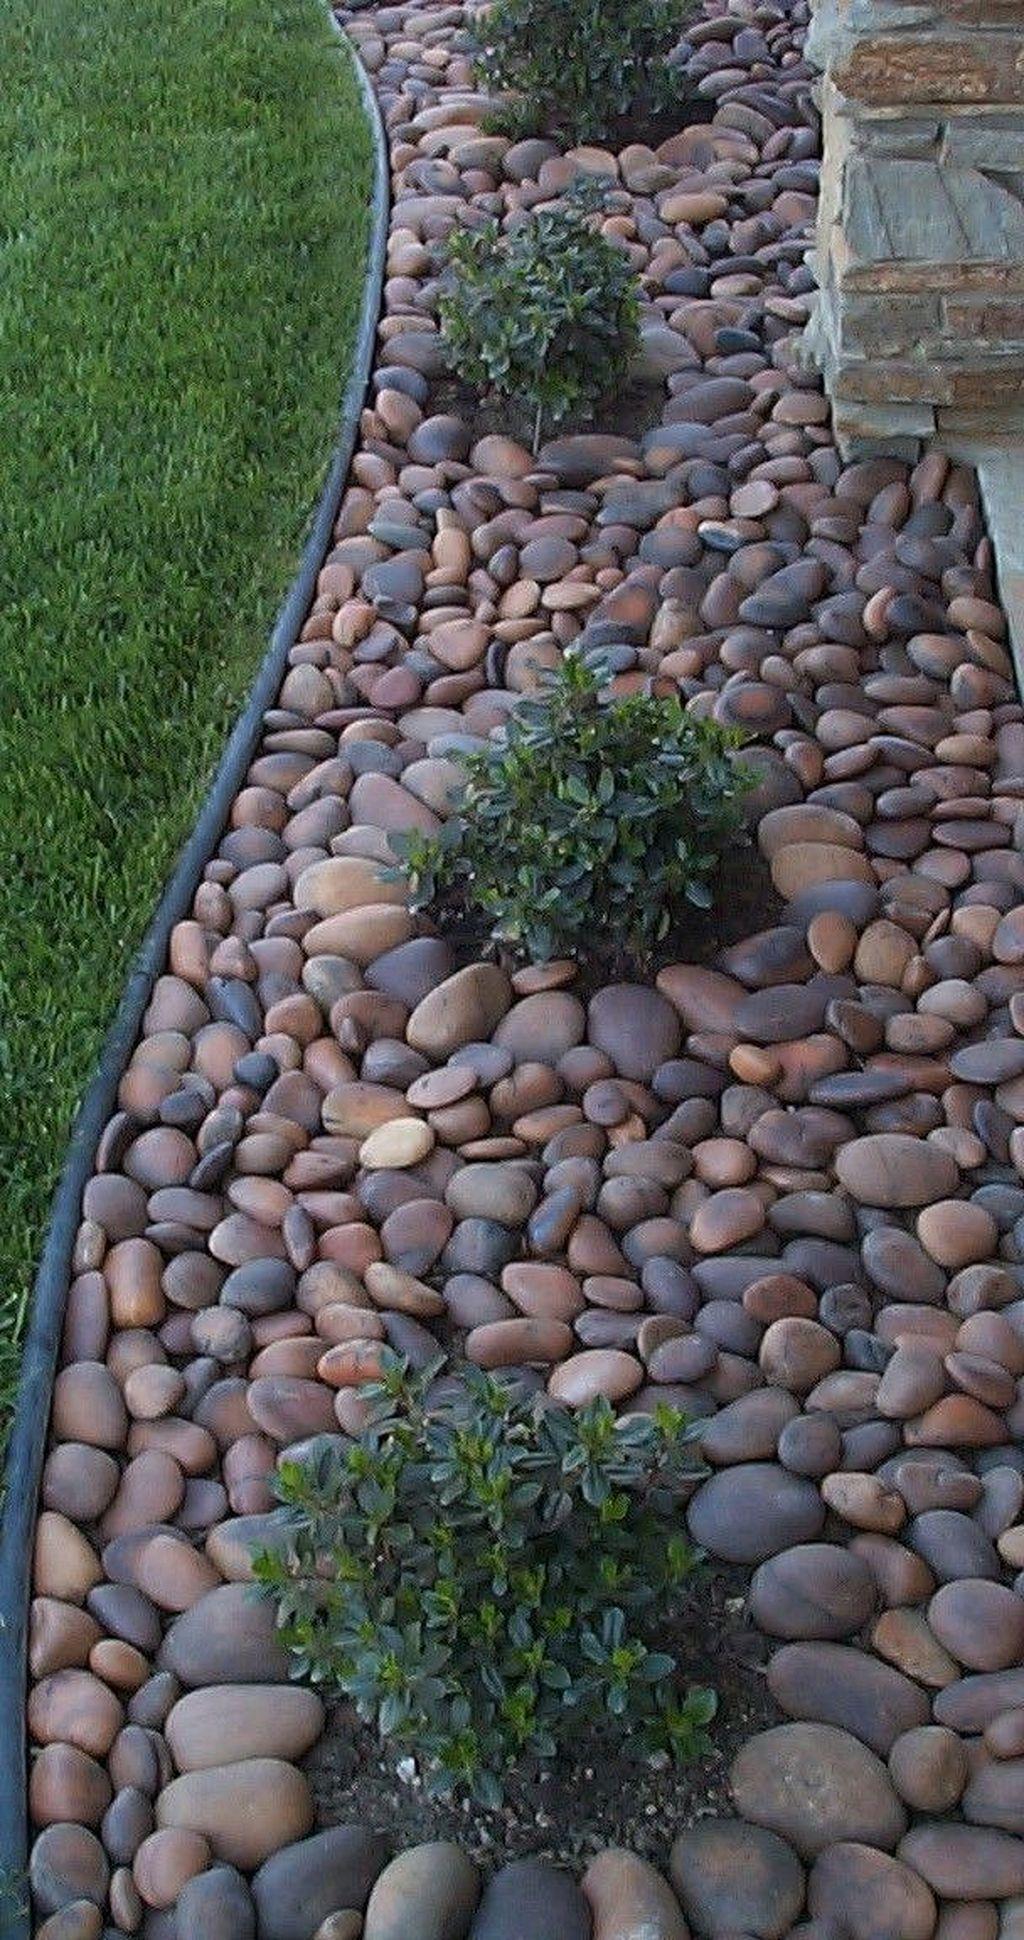 Stunning 30 Fancy Garden Decorating Ideas With Rocks And Stones Https Kidmagz Com 3 Landscaping With Rocks Front Yard Landscaping Small Backyard Landscaping